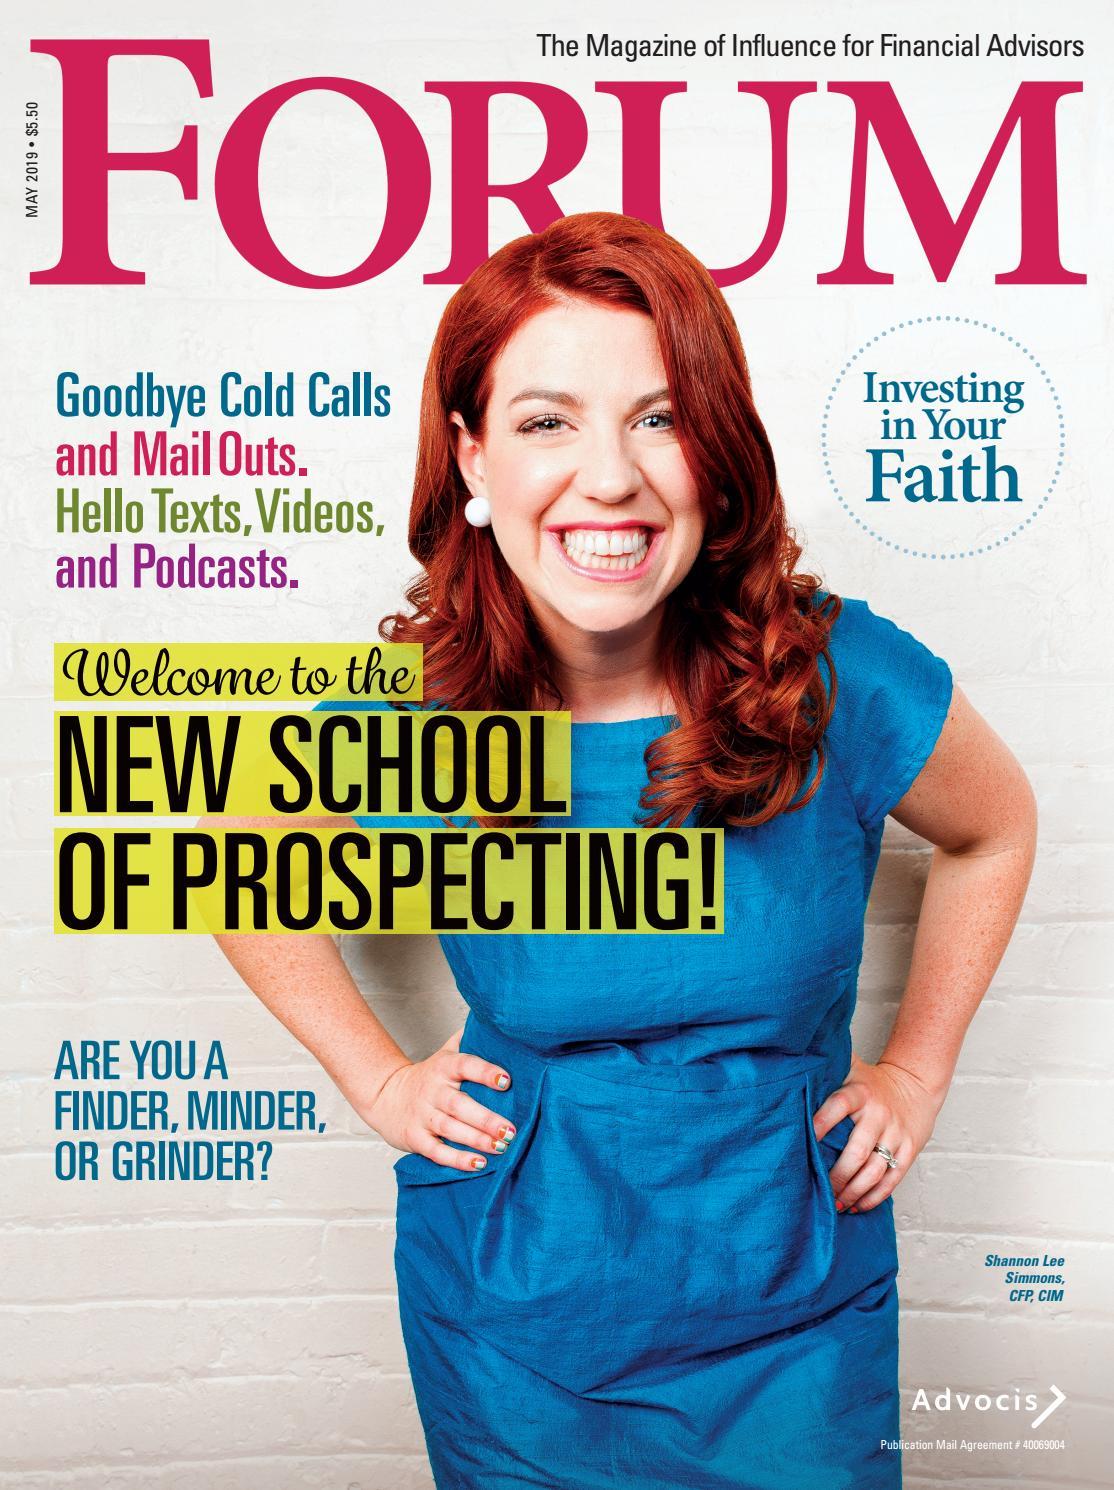 Alma Concepcion Hot forum magazine - may 2019forum magazine - issuu